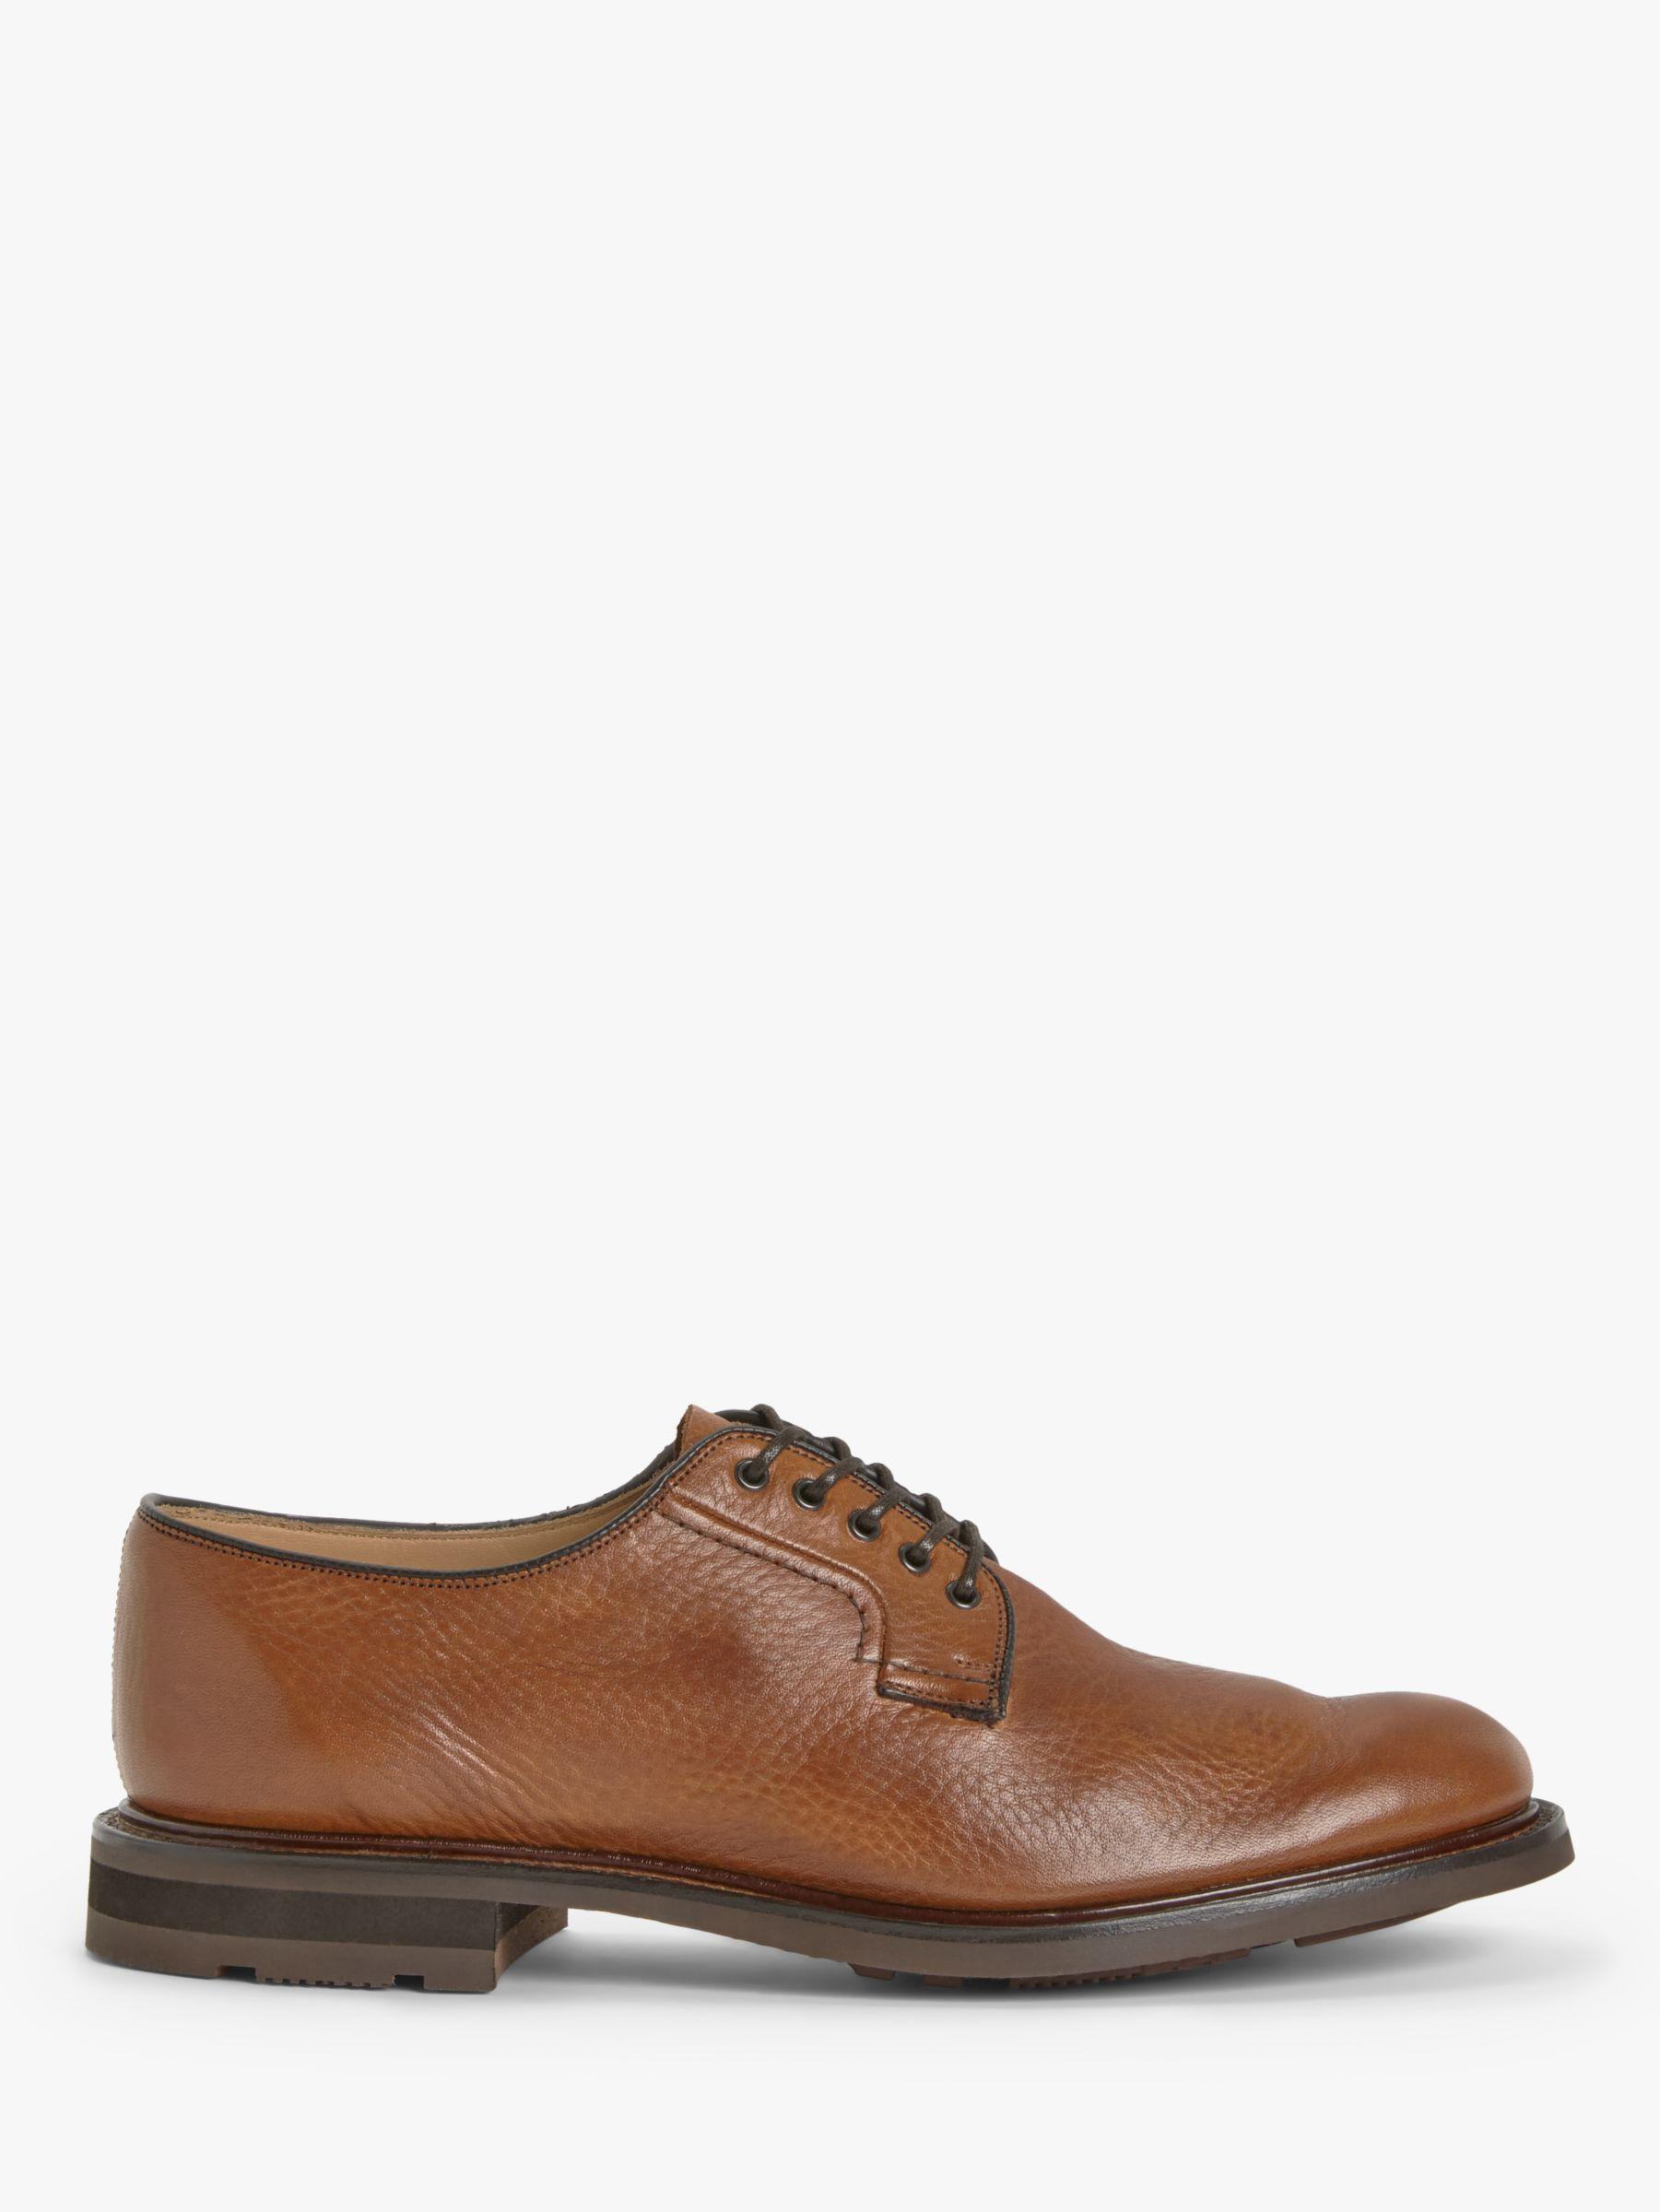 Church's Church's Bestone Leather Derby Shoes, Walnut